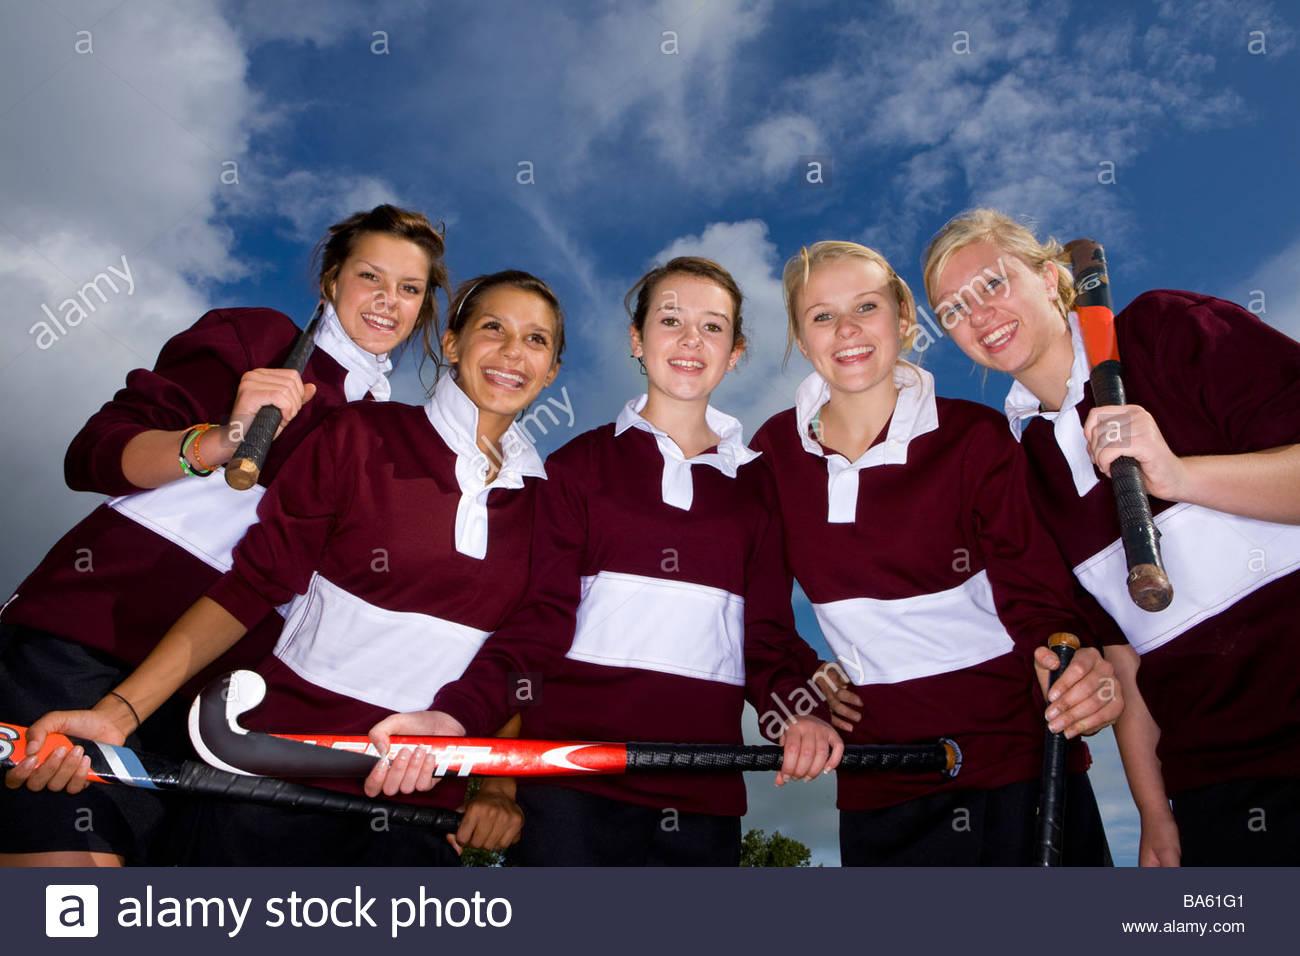 Portrait of smiling teenage girls holding field hockey sticks - Stock Image